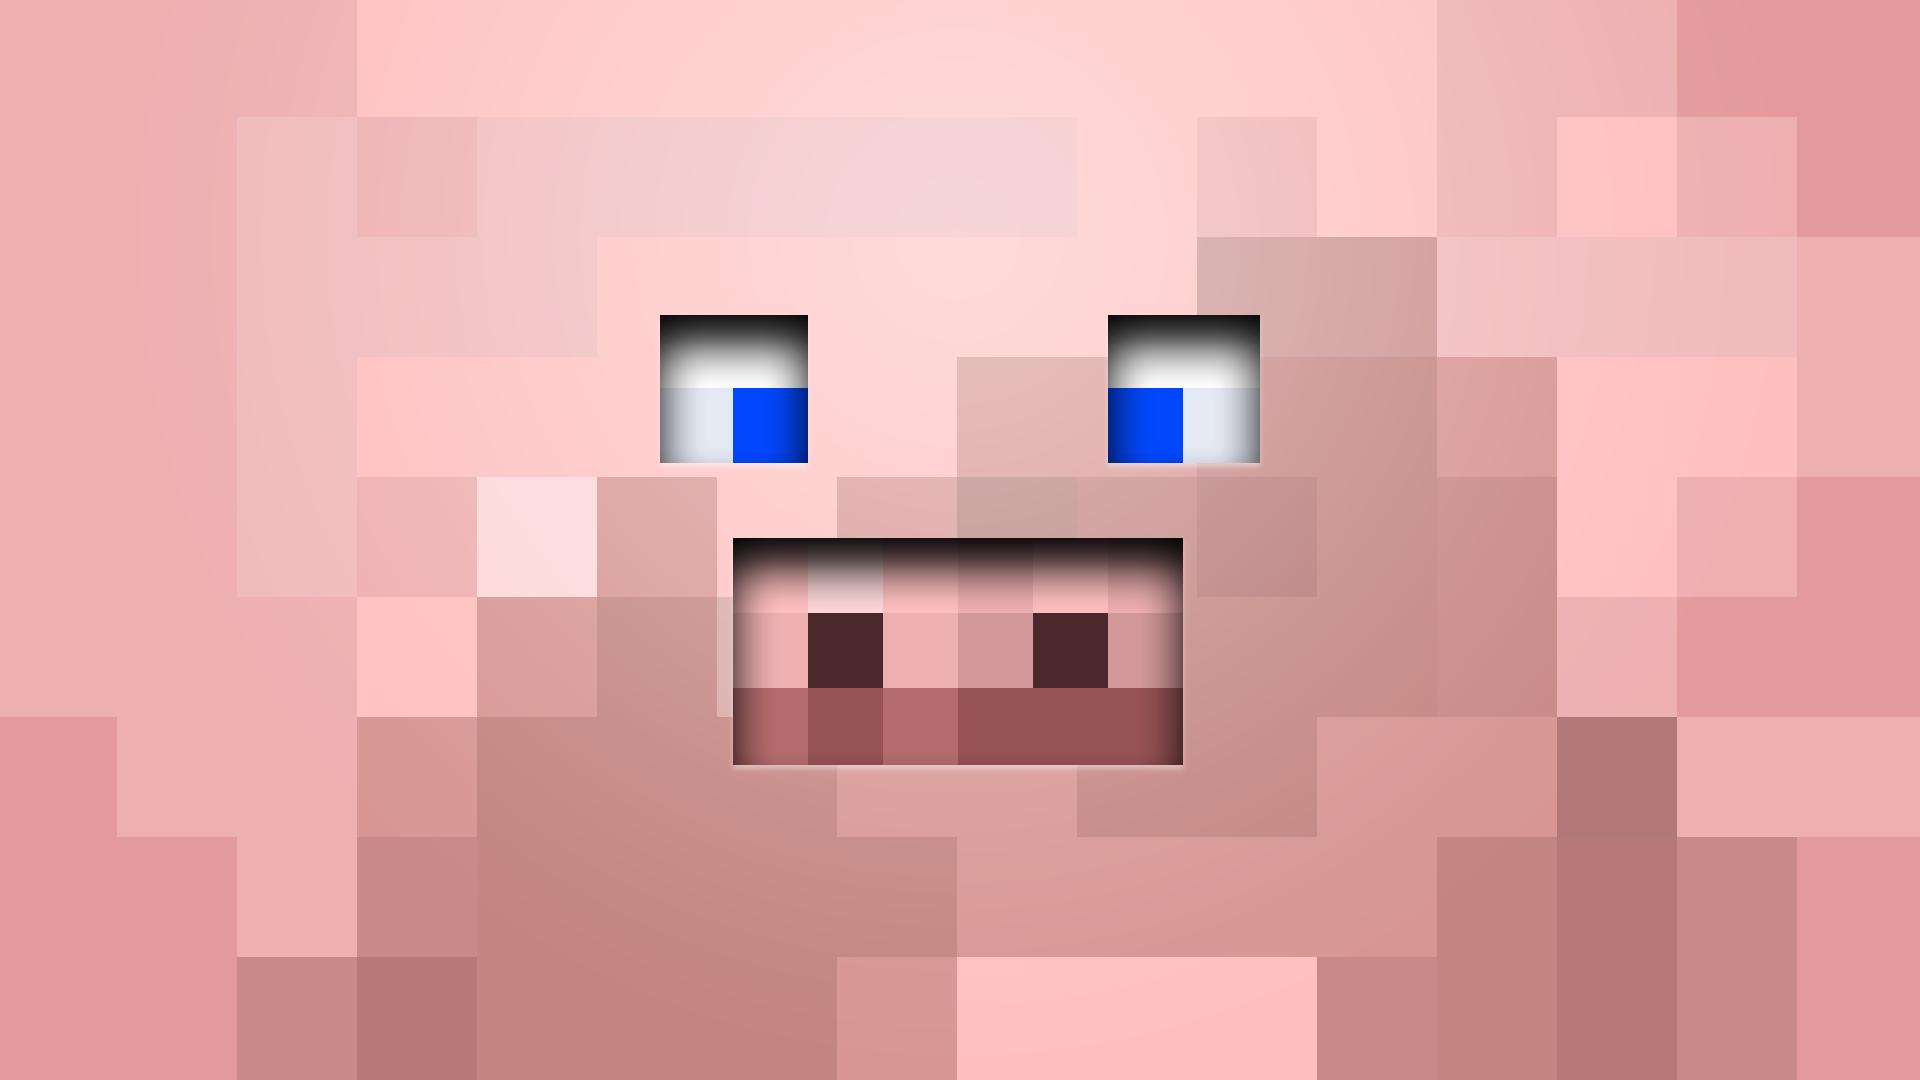 Minecraft Pig Png 1920 1080 Minecraft Pig Face Minecraft Pig Pig Wallpaper